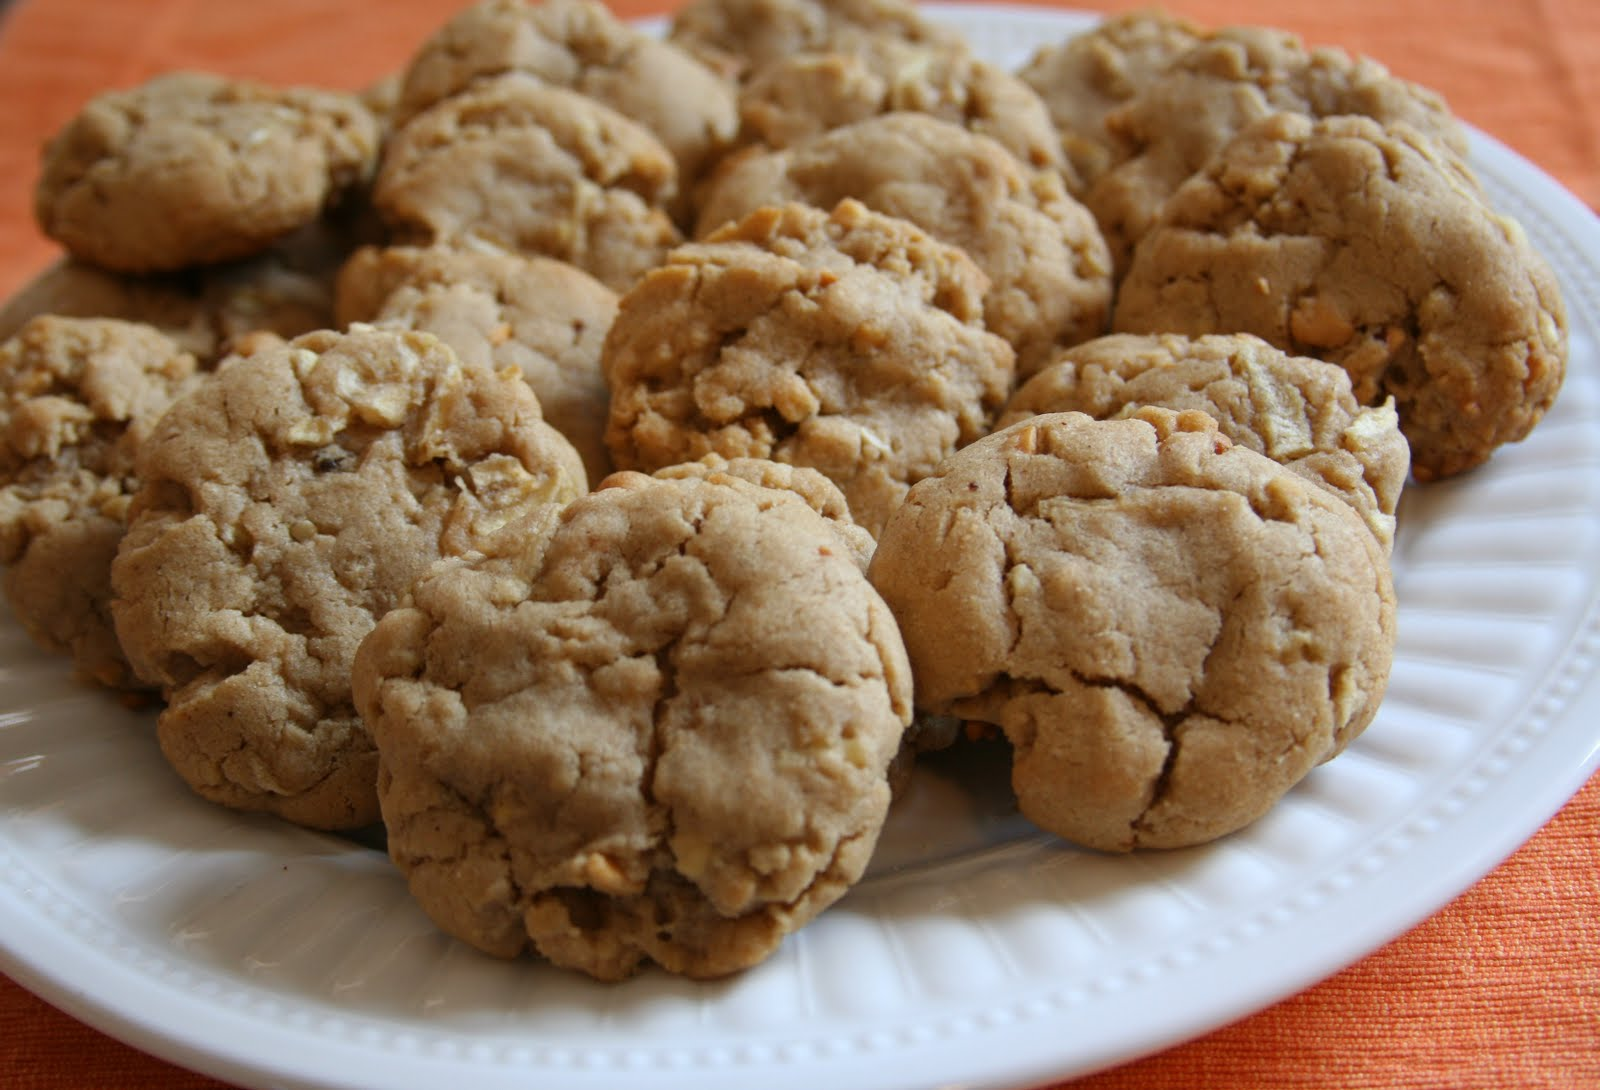 Apple Peanut Butter Cookies - Honeybear Lane